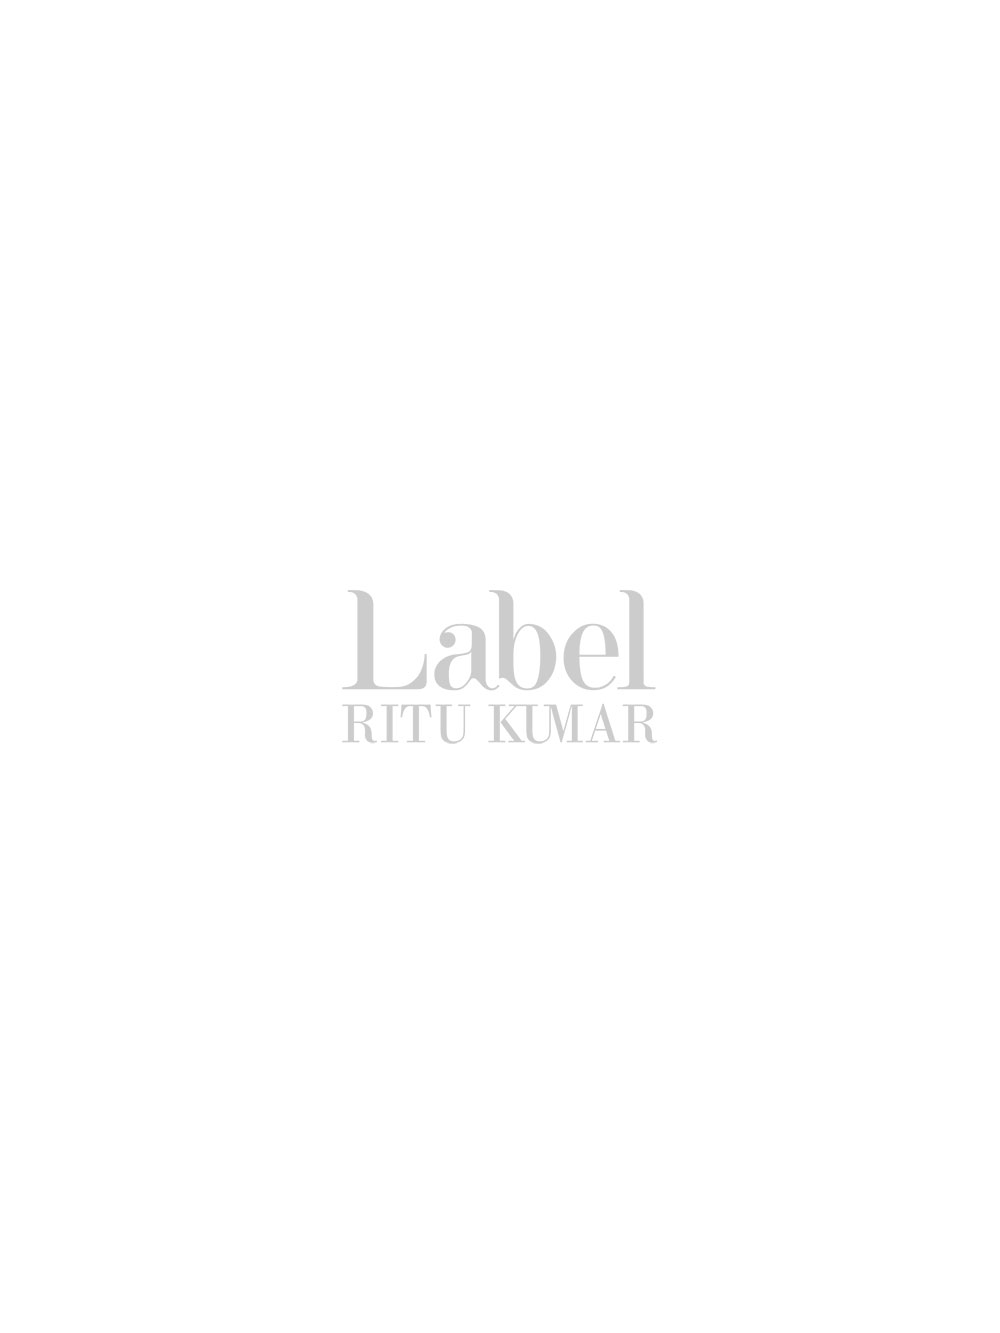 Designer Floral Print Black Midi Dress by Label Ritu Kumar